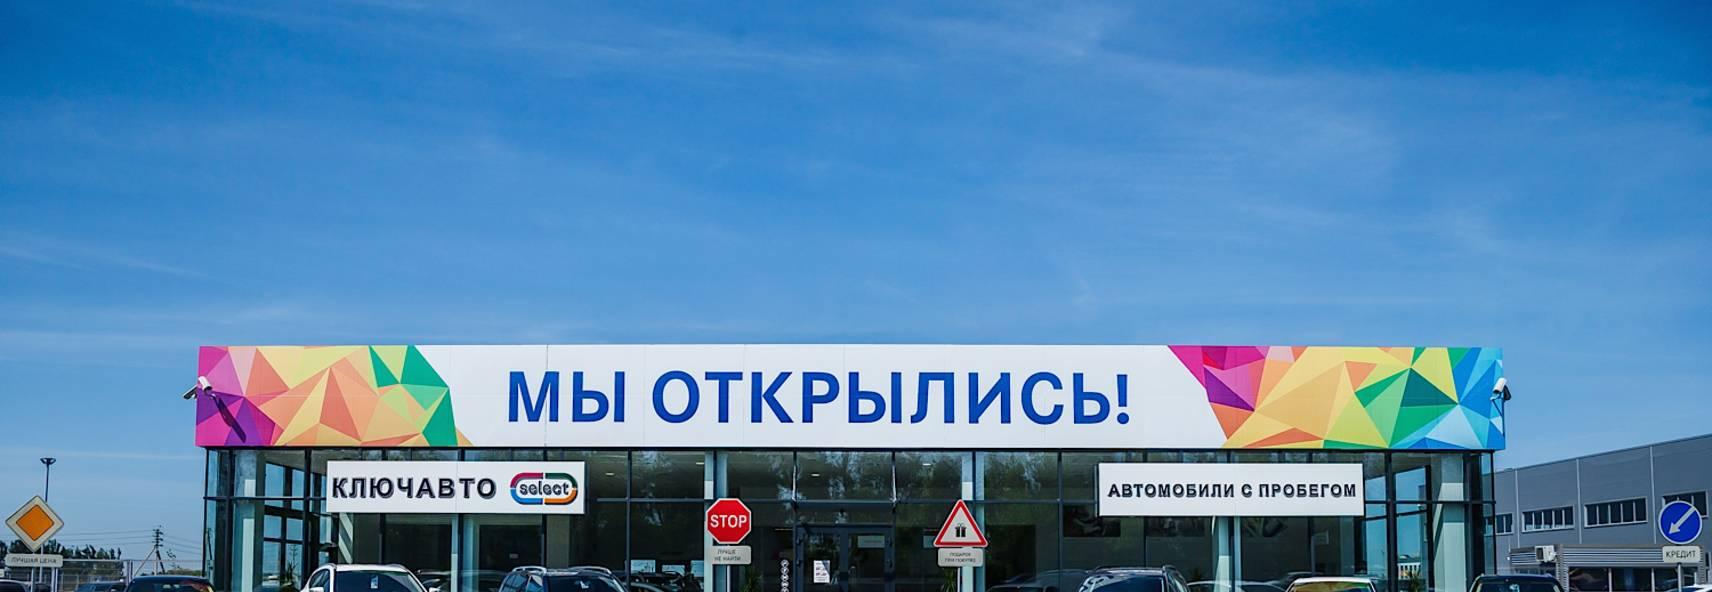 КЛЮЧАВТО-Select Краснодар на Красной Площади